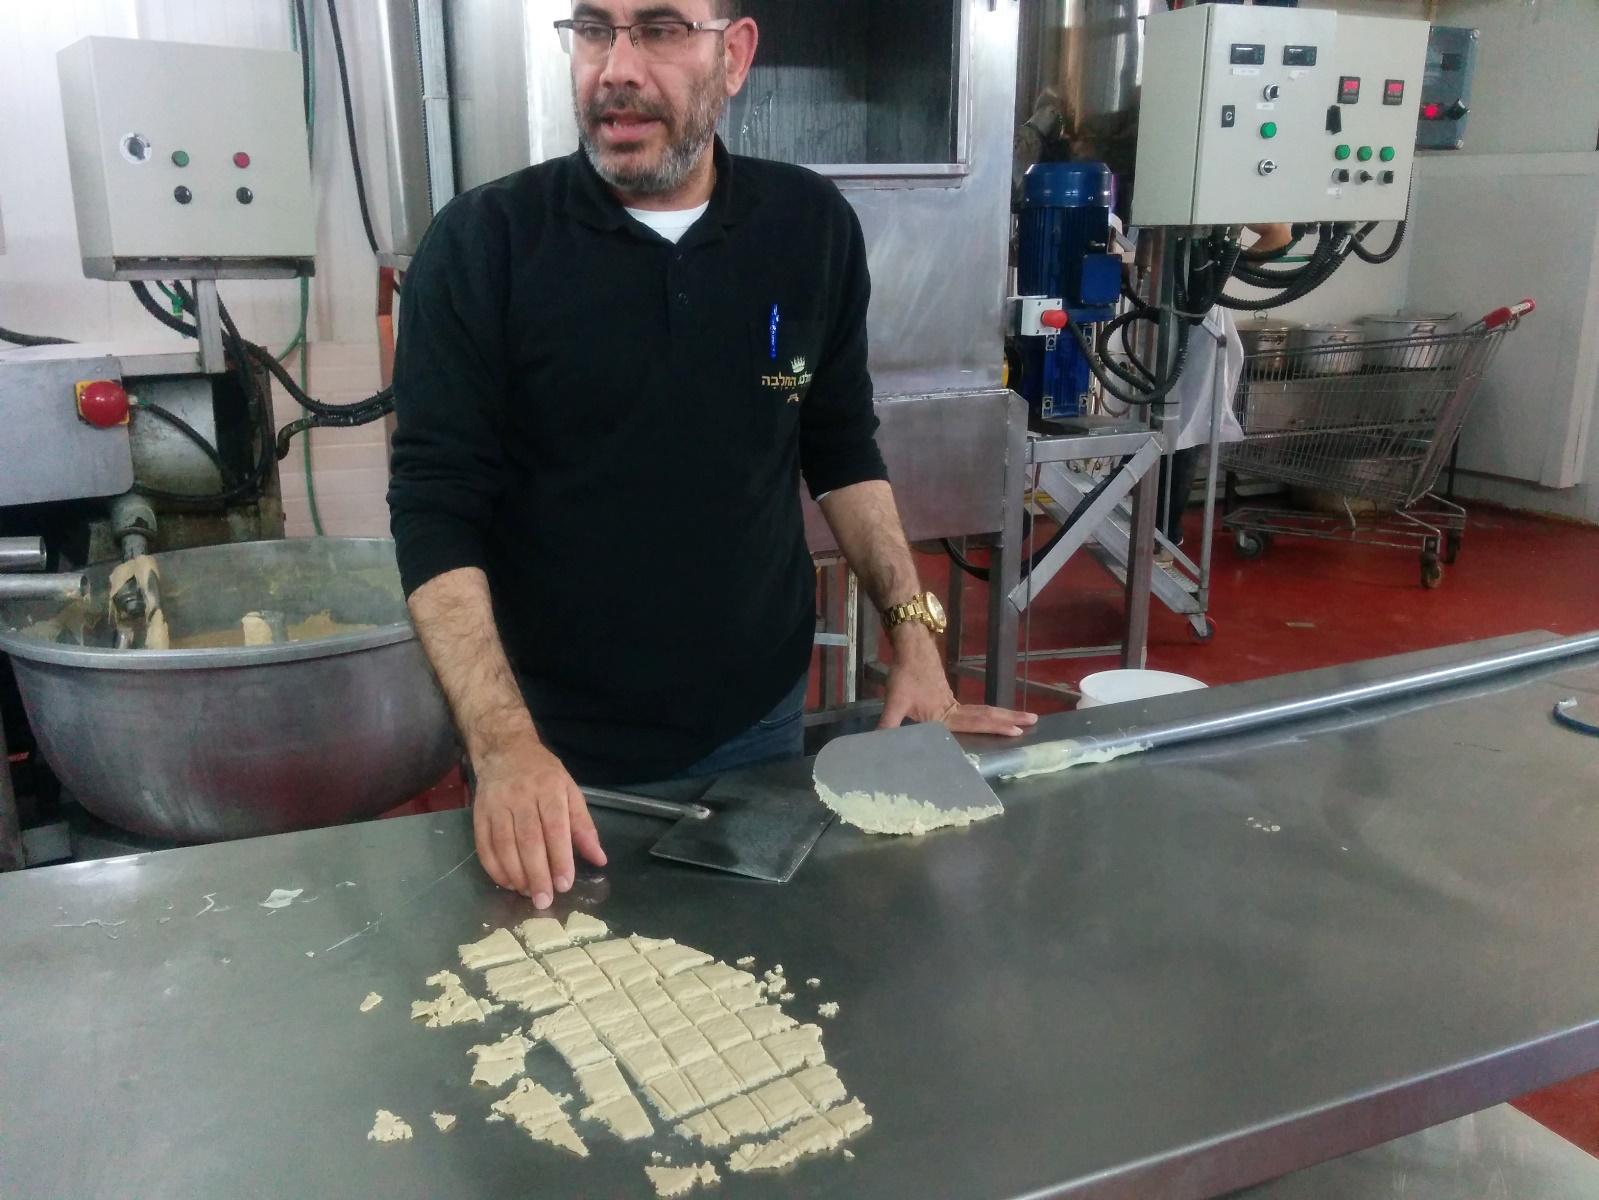 Shafrir Levi slicing freshly made vanilla halva at the Halva Kingdom factory. Photo by Abigail Klein Leichman